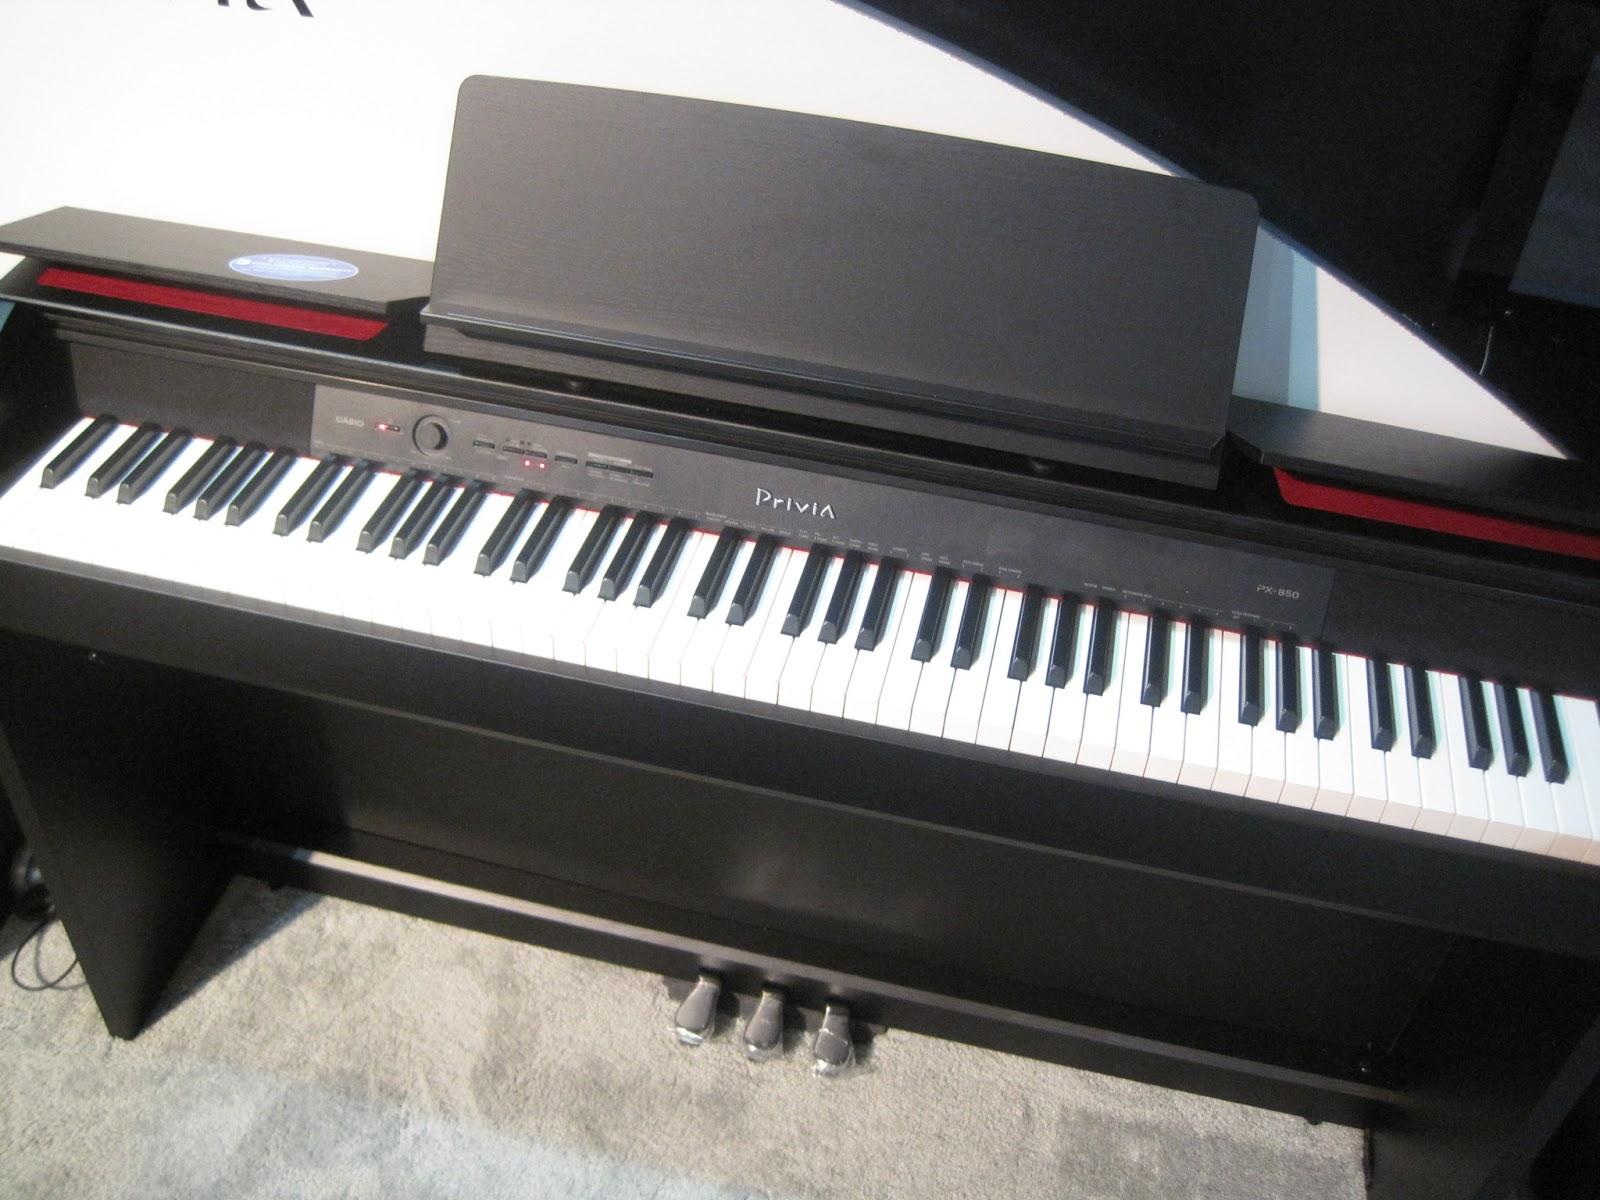 azpianonews reviews reviews digital pianos under 2500 my top picks kawai mp7 casio. Black Bedroom Furniture Sets. Home Design Ideas